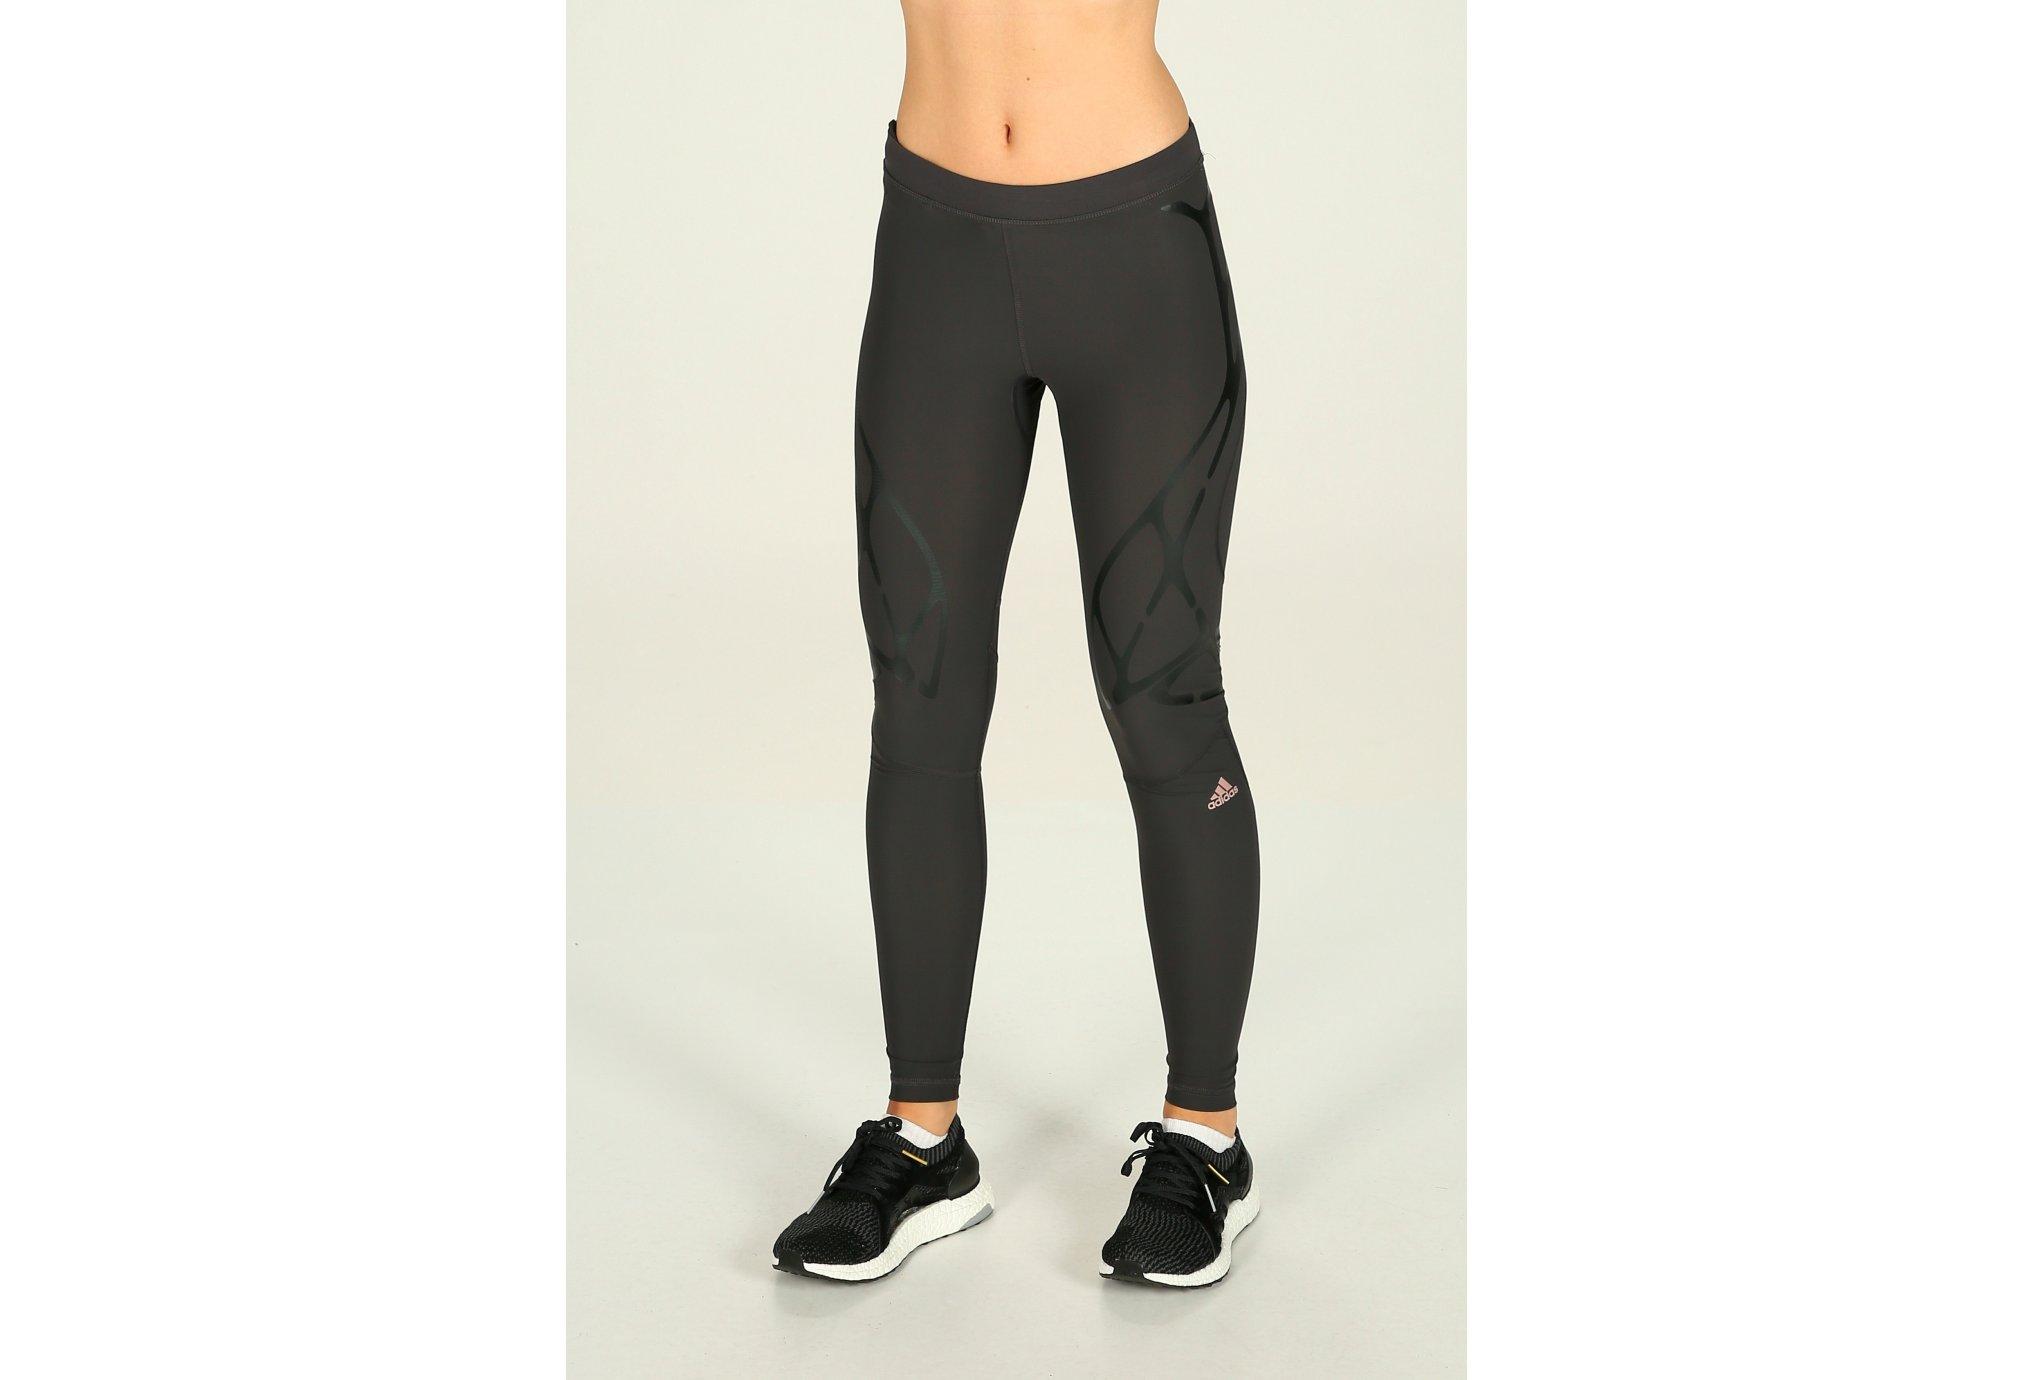 Adidas Adizero sprintweb w vêtement running femme